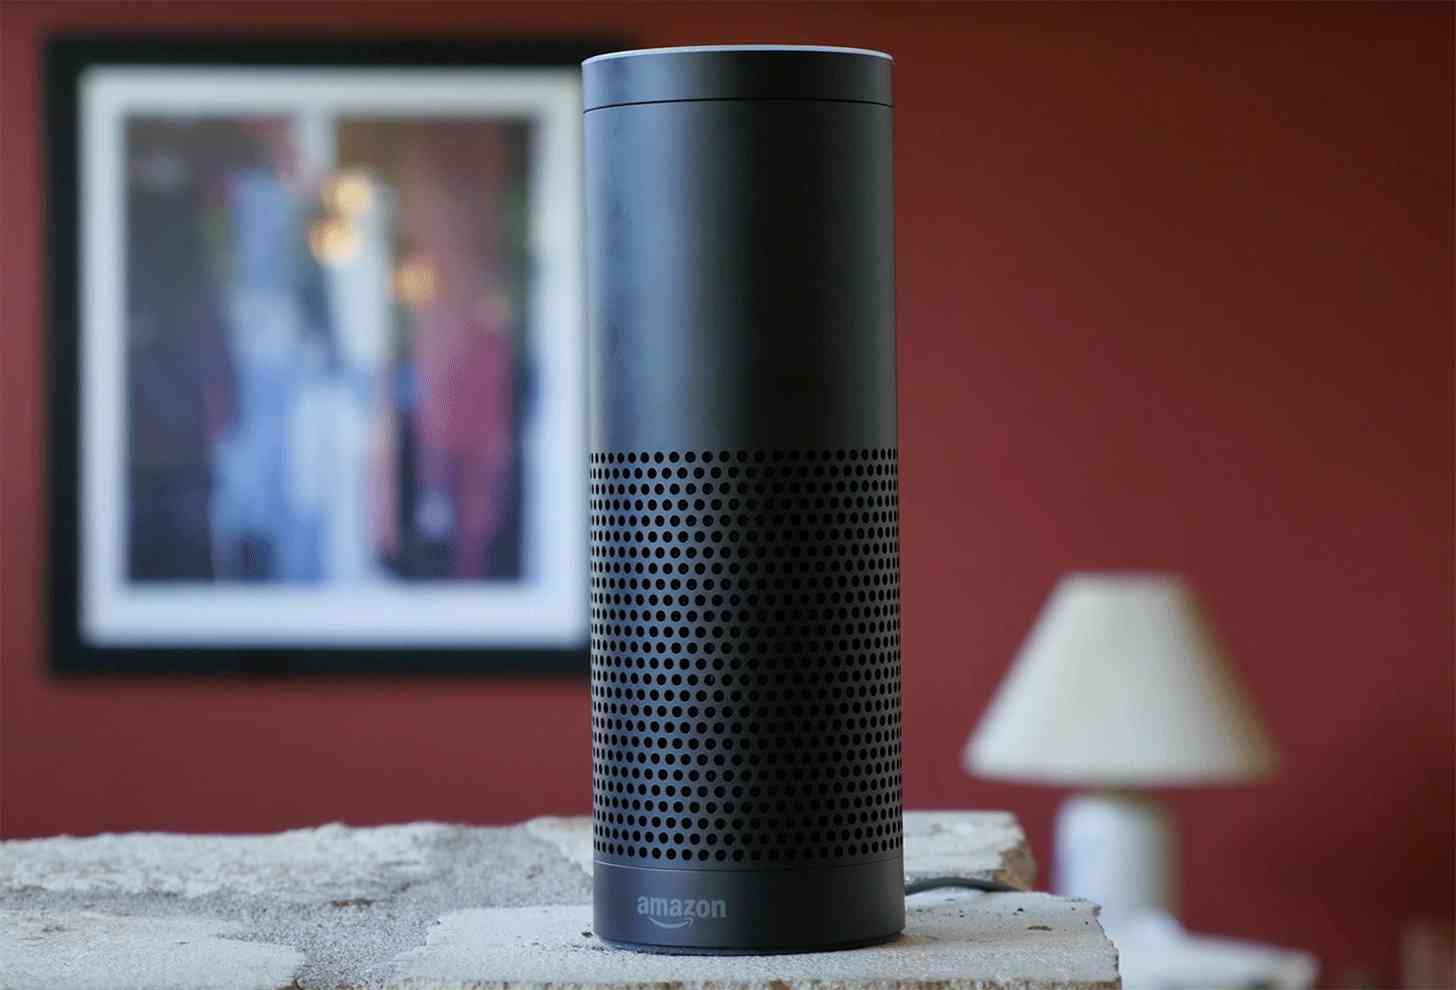 Amazon Echo video review